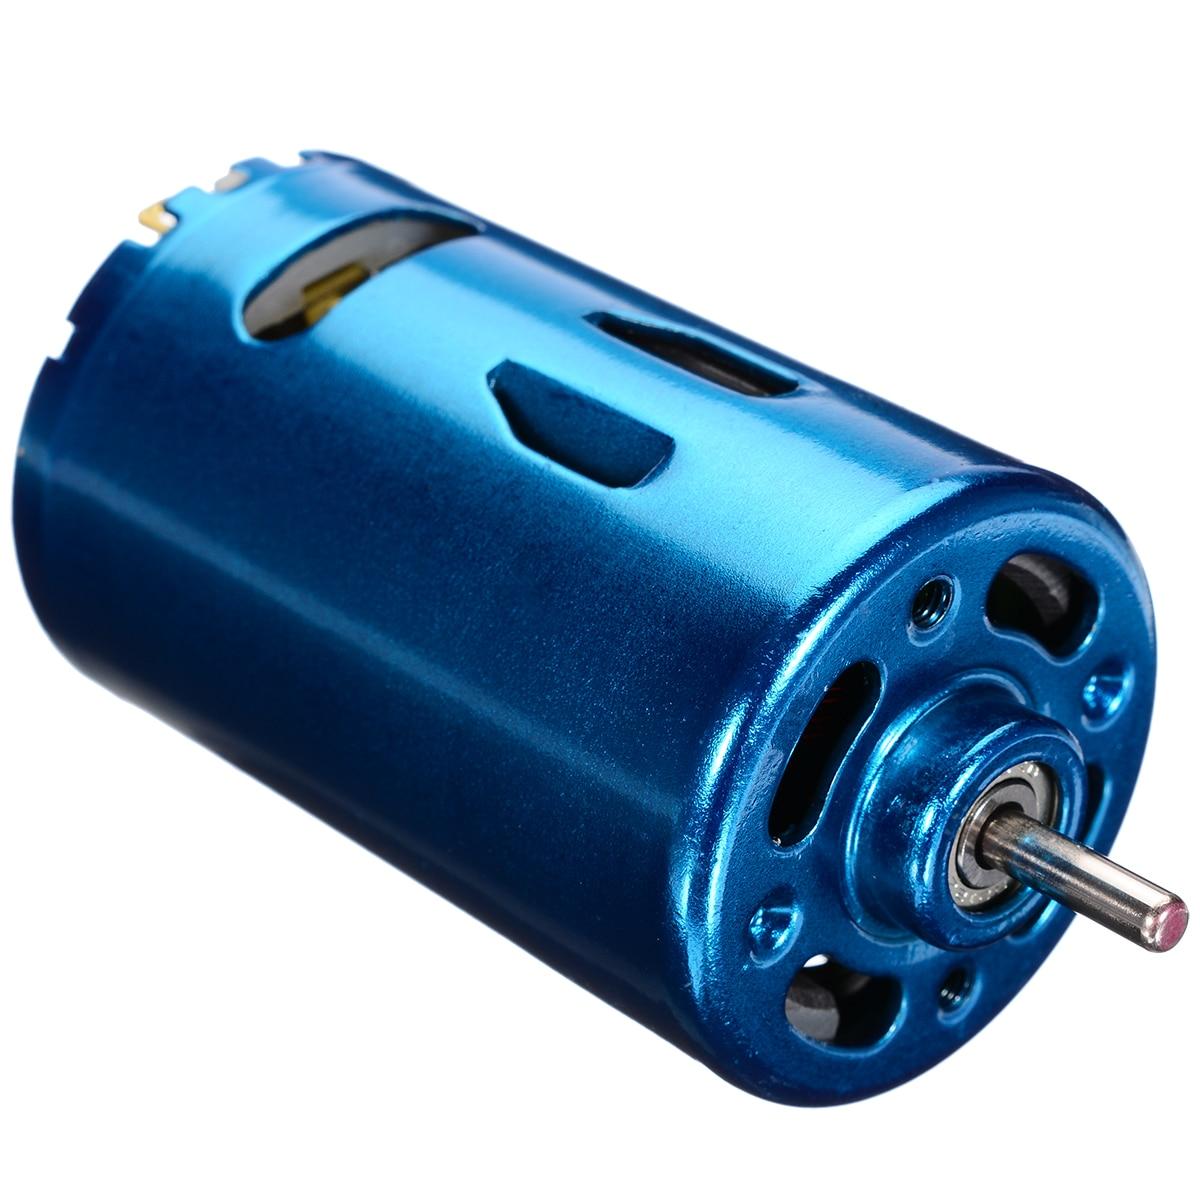 1pc Blue RS-550 DC Motor High Speed Large Torque RC Car Boat Model 12V 24V 30000RPM